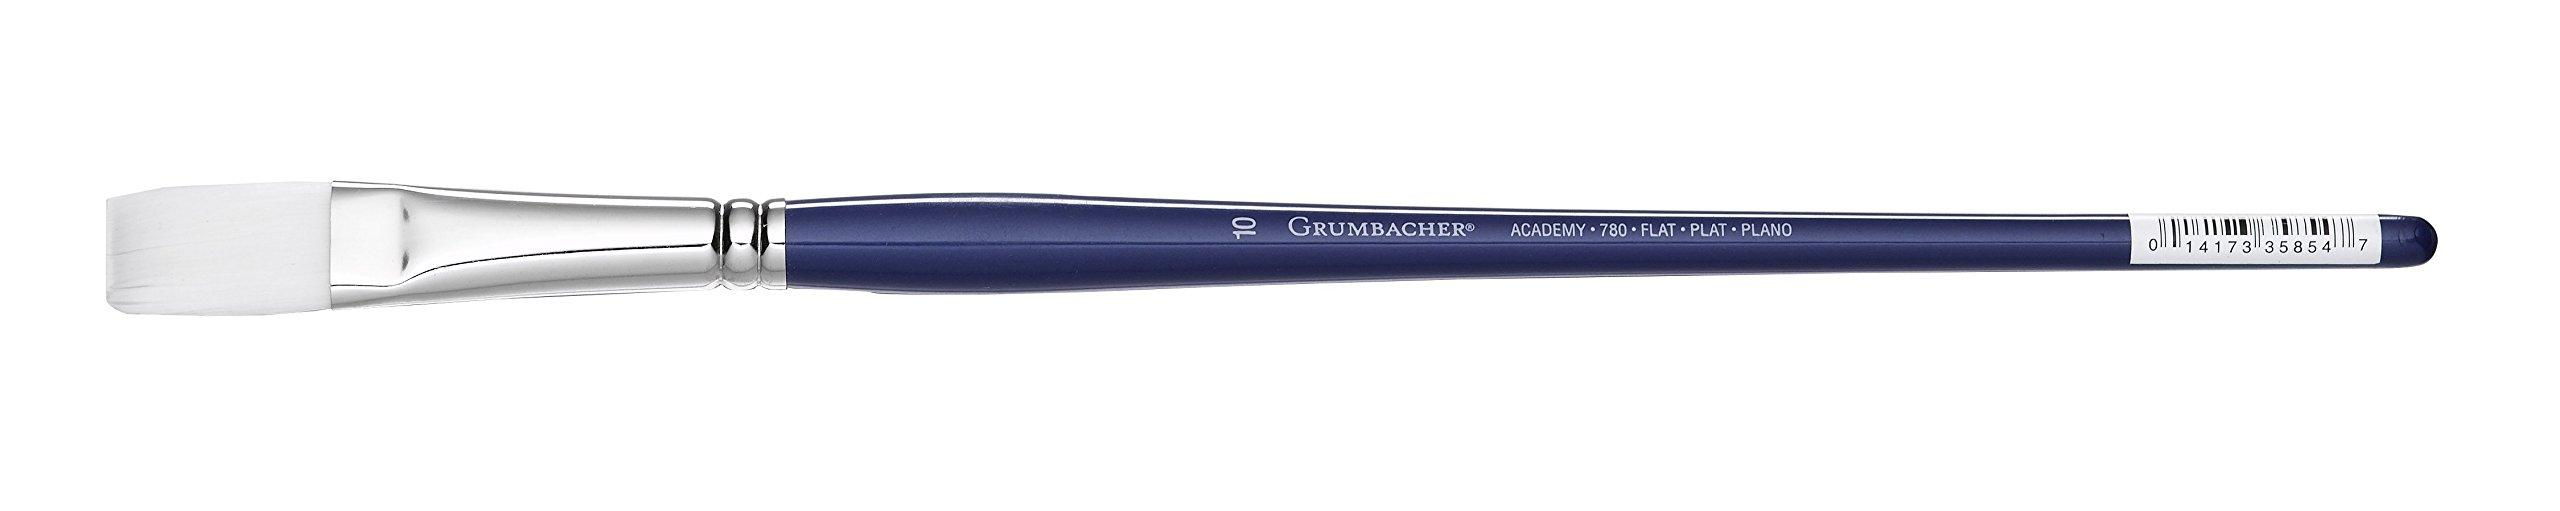 Grumbacher Academy Oil and Acrylic Flat Brush, White Nylon Bristles, Size 10 (780F.10)